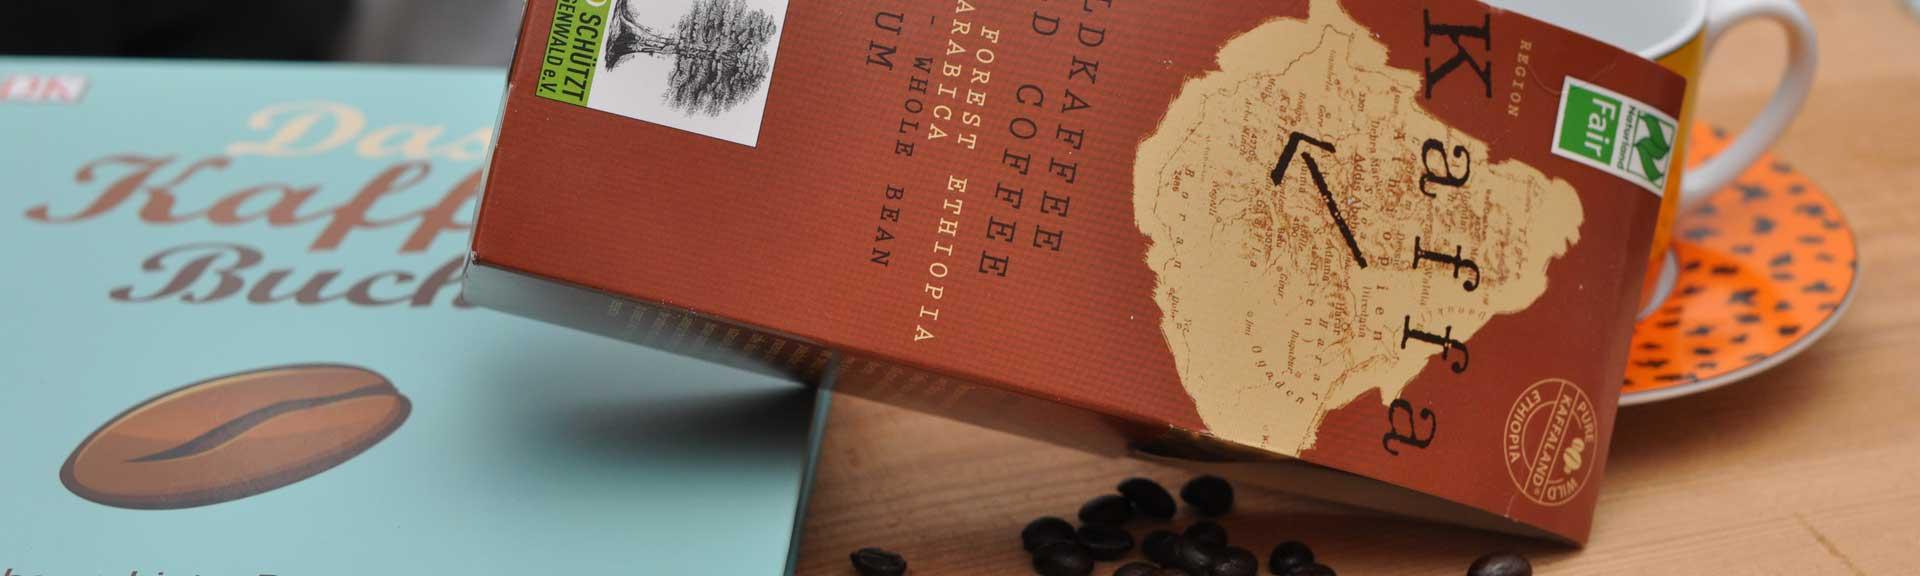 kaffa kaffee wildkaffee fair fairtrade